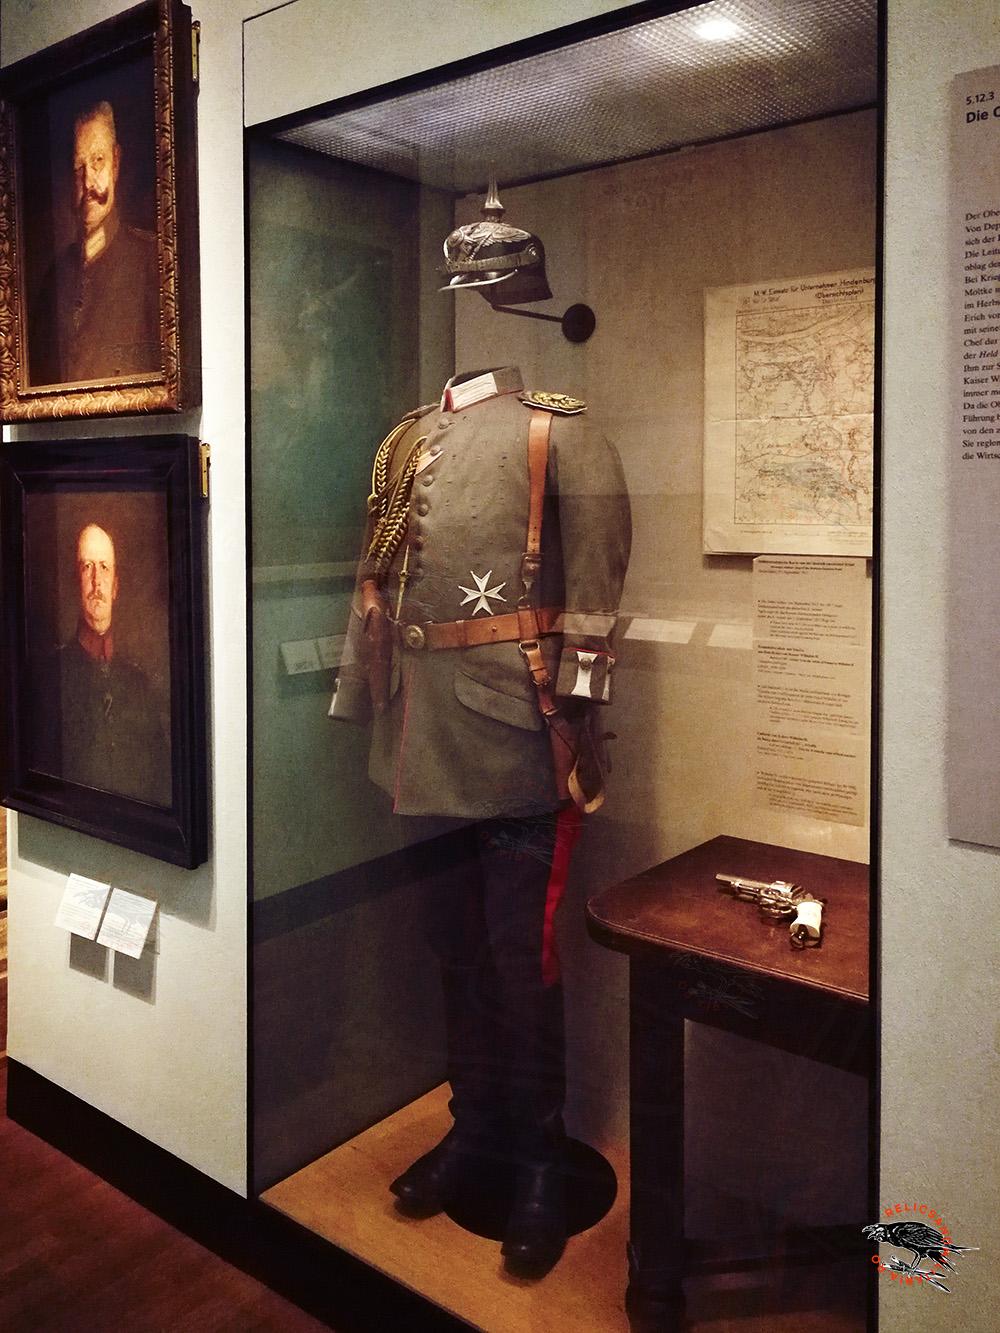 German ww1 Uniform and pickelhaube